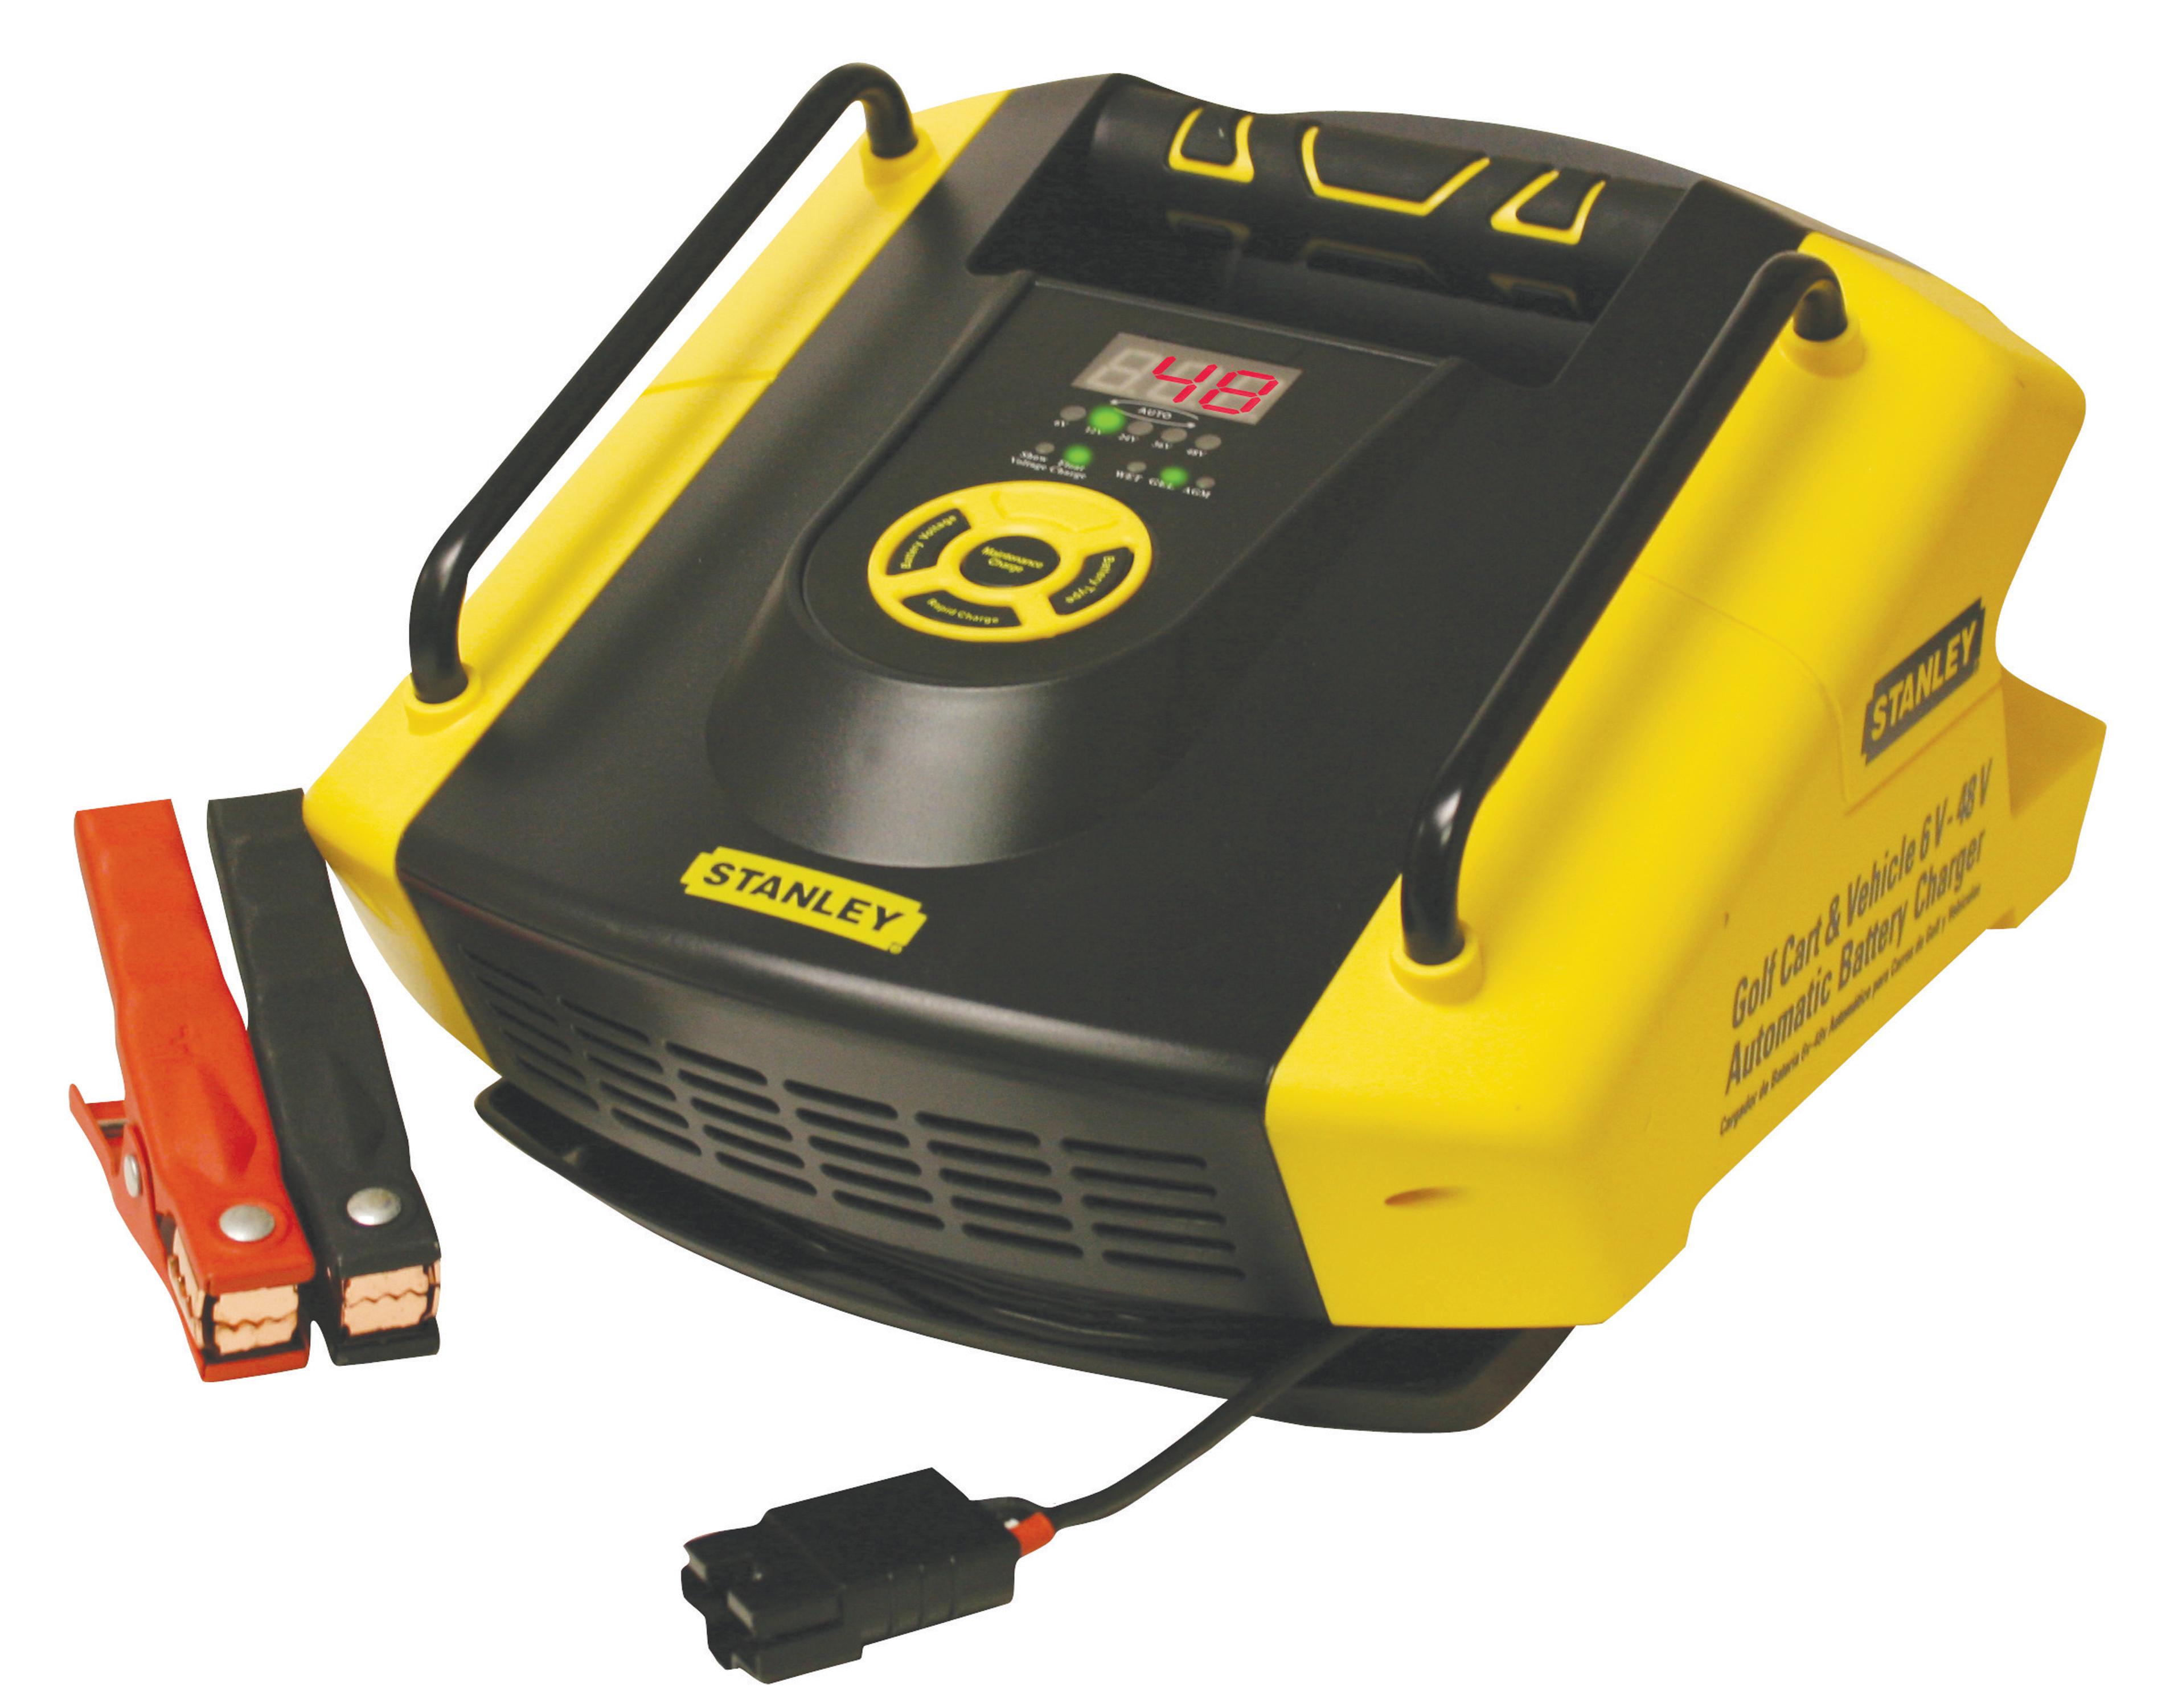 stanley gbcpro multi volt battery charger 6 volt to 48 volt golf cart and vehicles. Black Bedroom Furniture Sets. Home Design Ideas